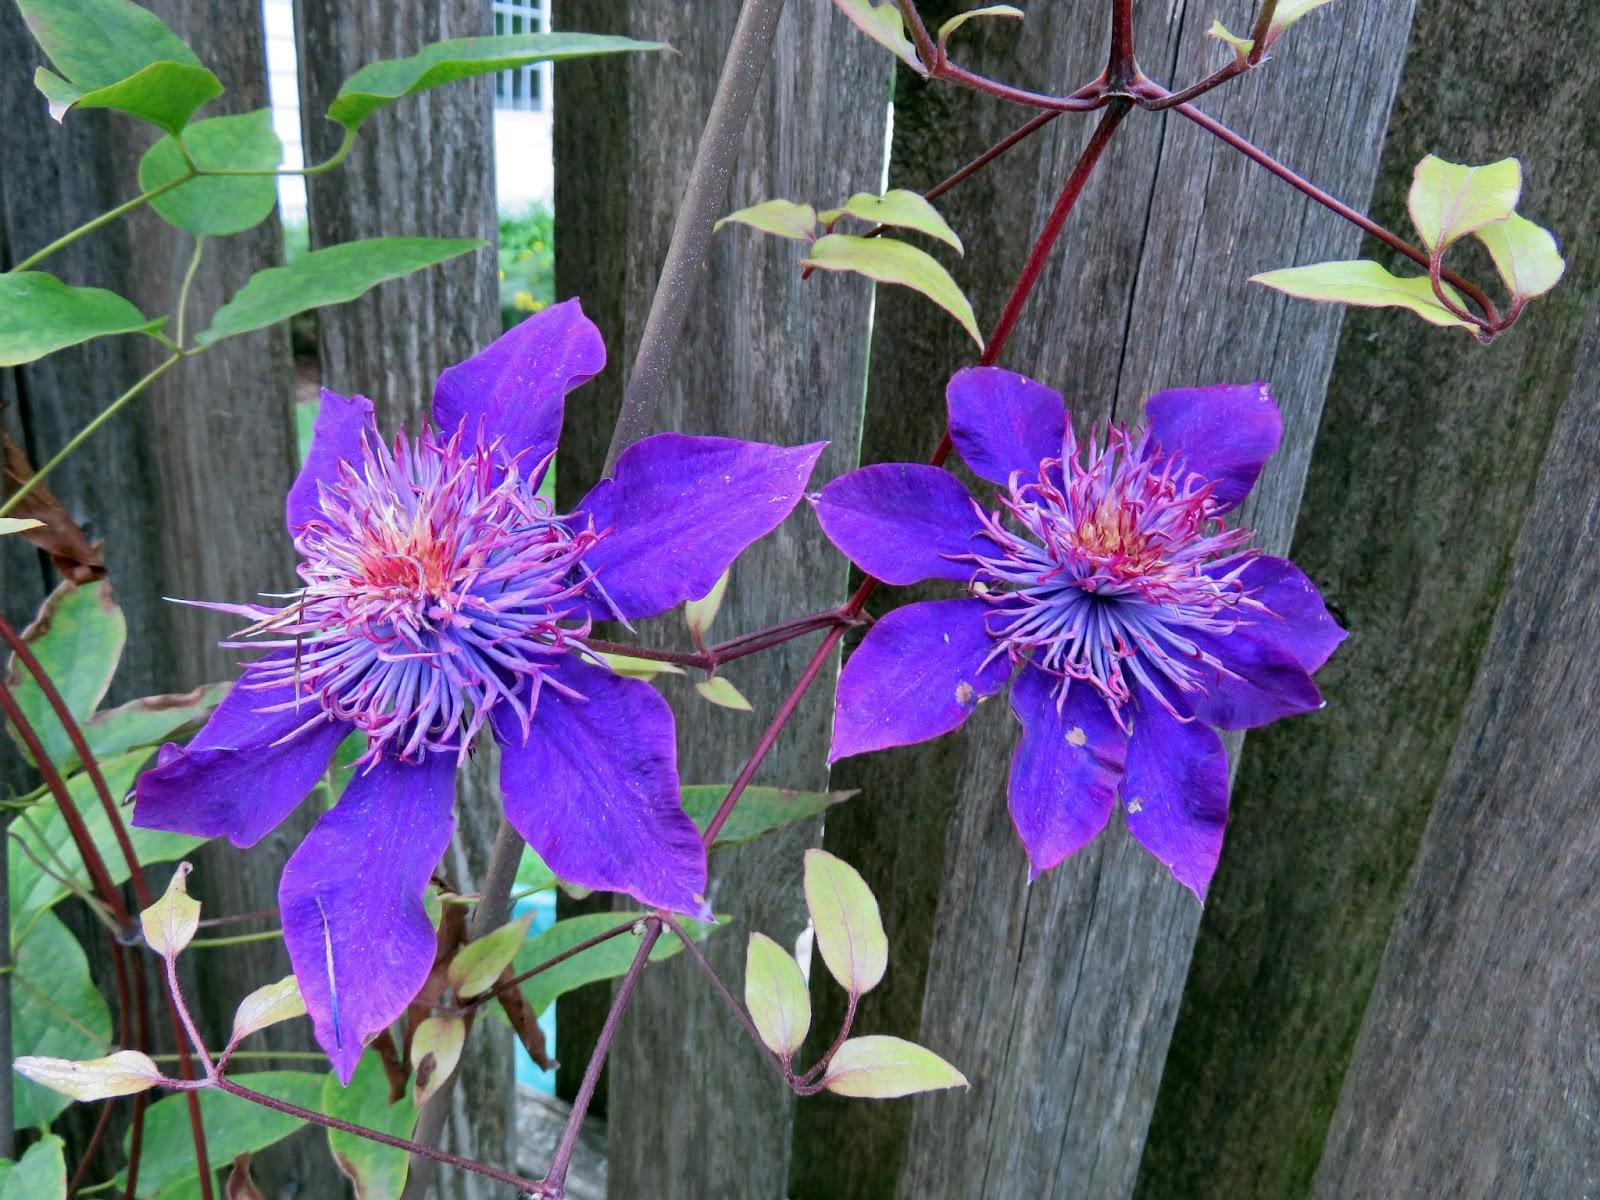 gatsbys gardens late bloomers. Black Bedroom Furniture Sets. Home Design Ideas